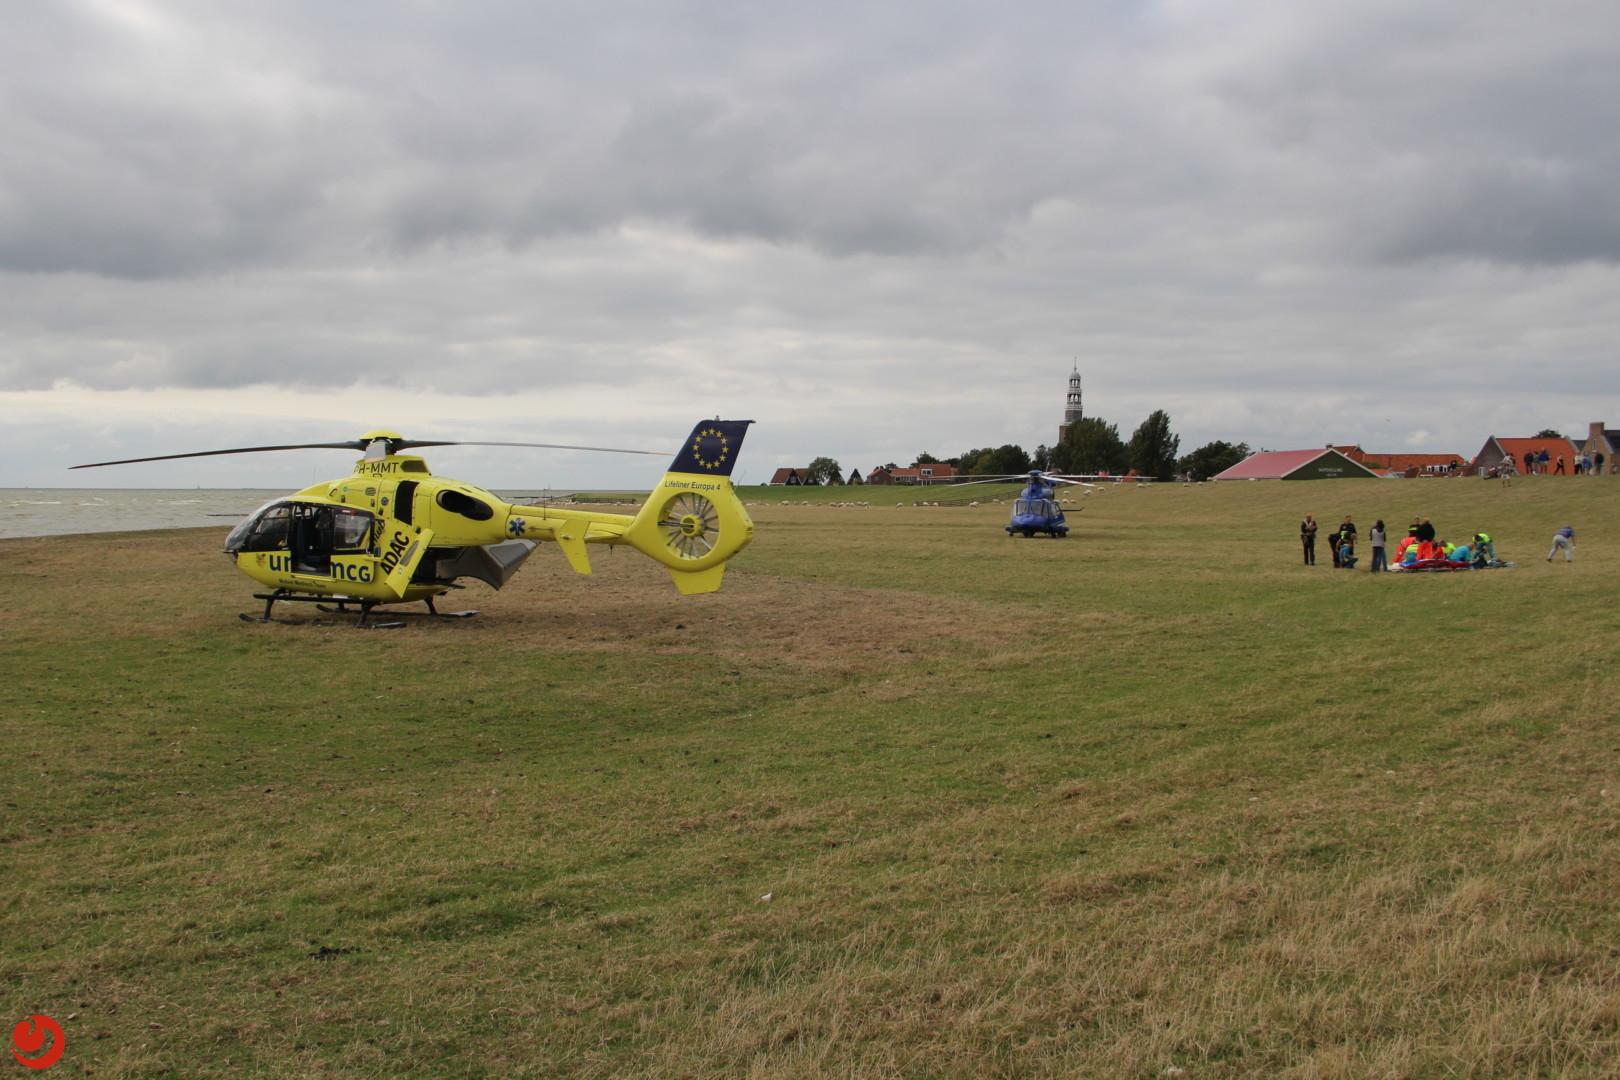 Twee helikopters ingezet bij ongeval met kitesurfer